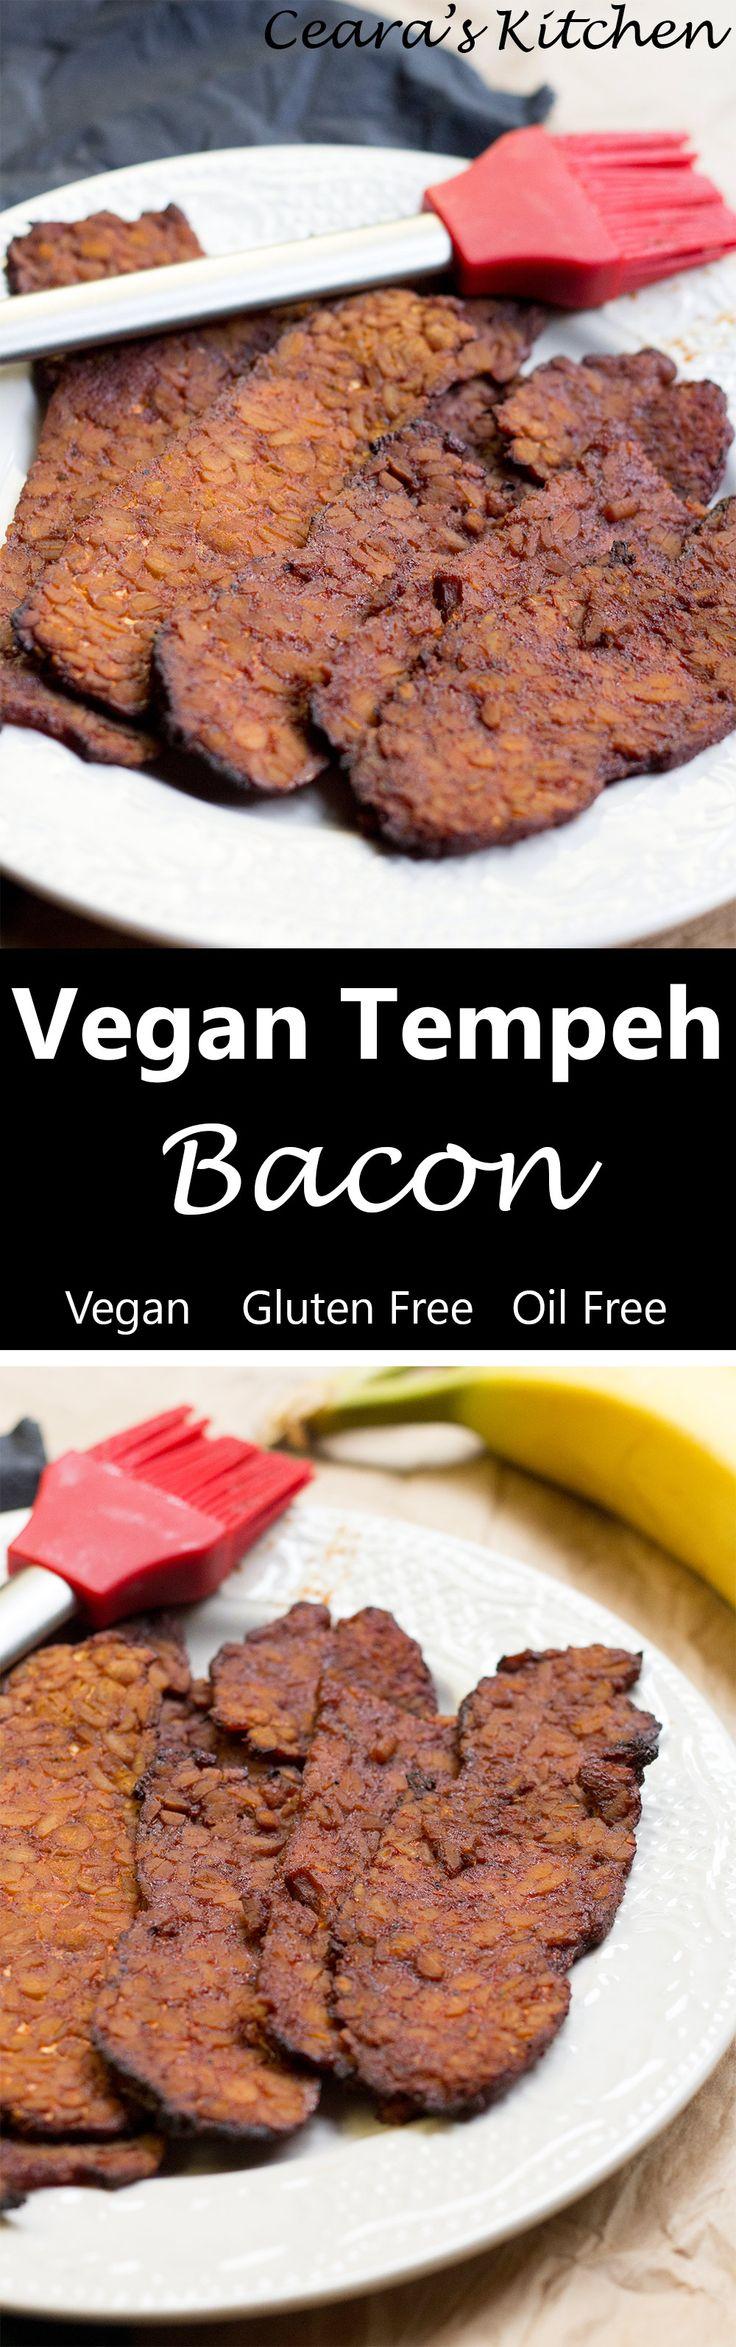 Vegan Tempeh Bacon Baked NOT Fried!